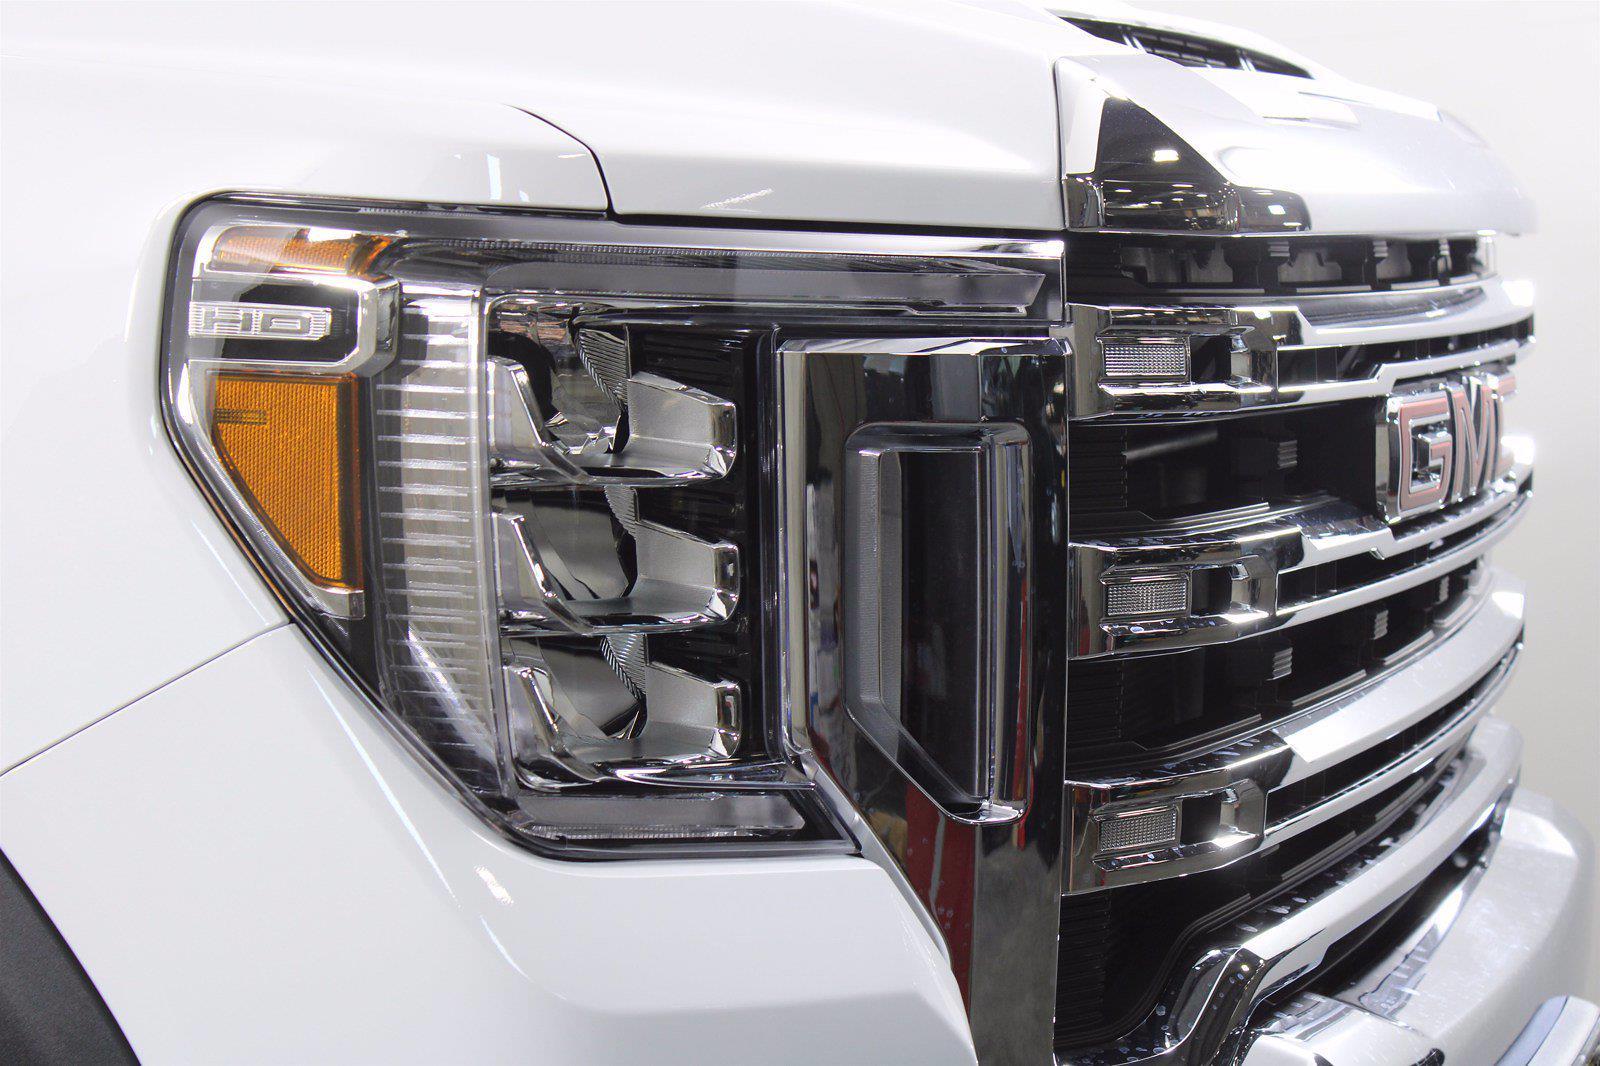 2022 Sierra 2500 Regular Cab 4x4,  Pickup #D420036 - photo 5